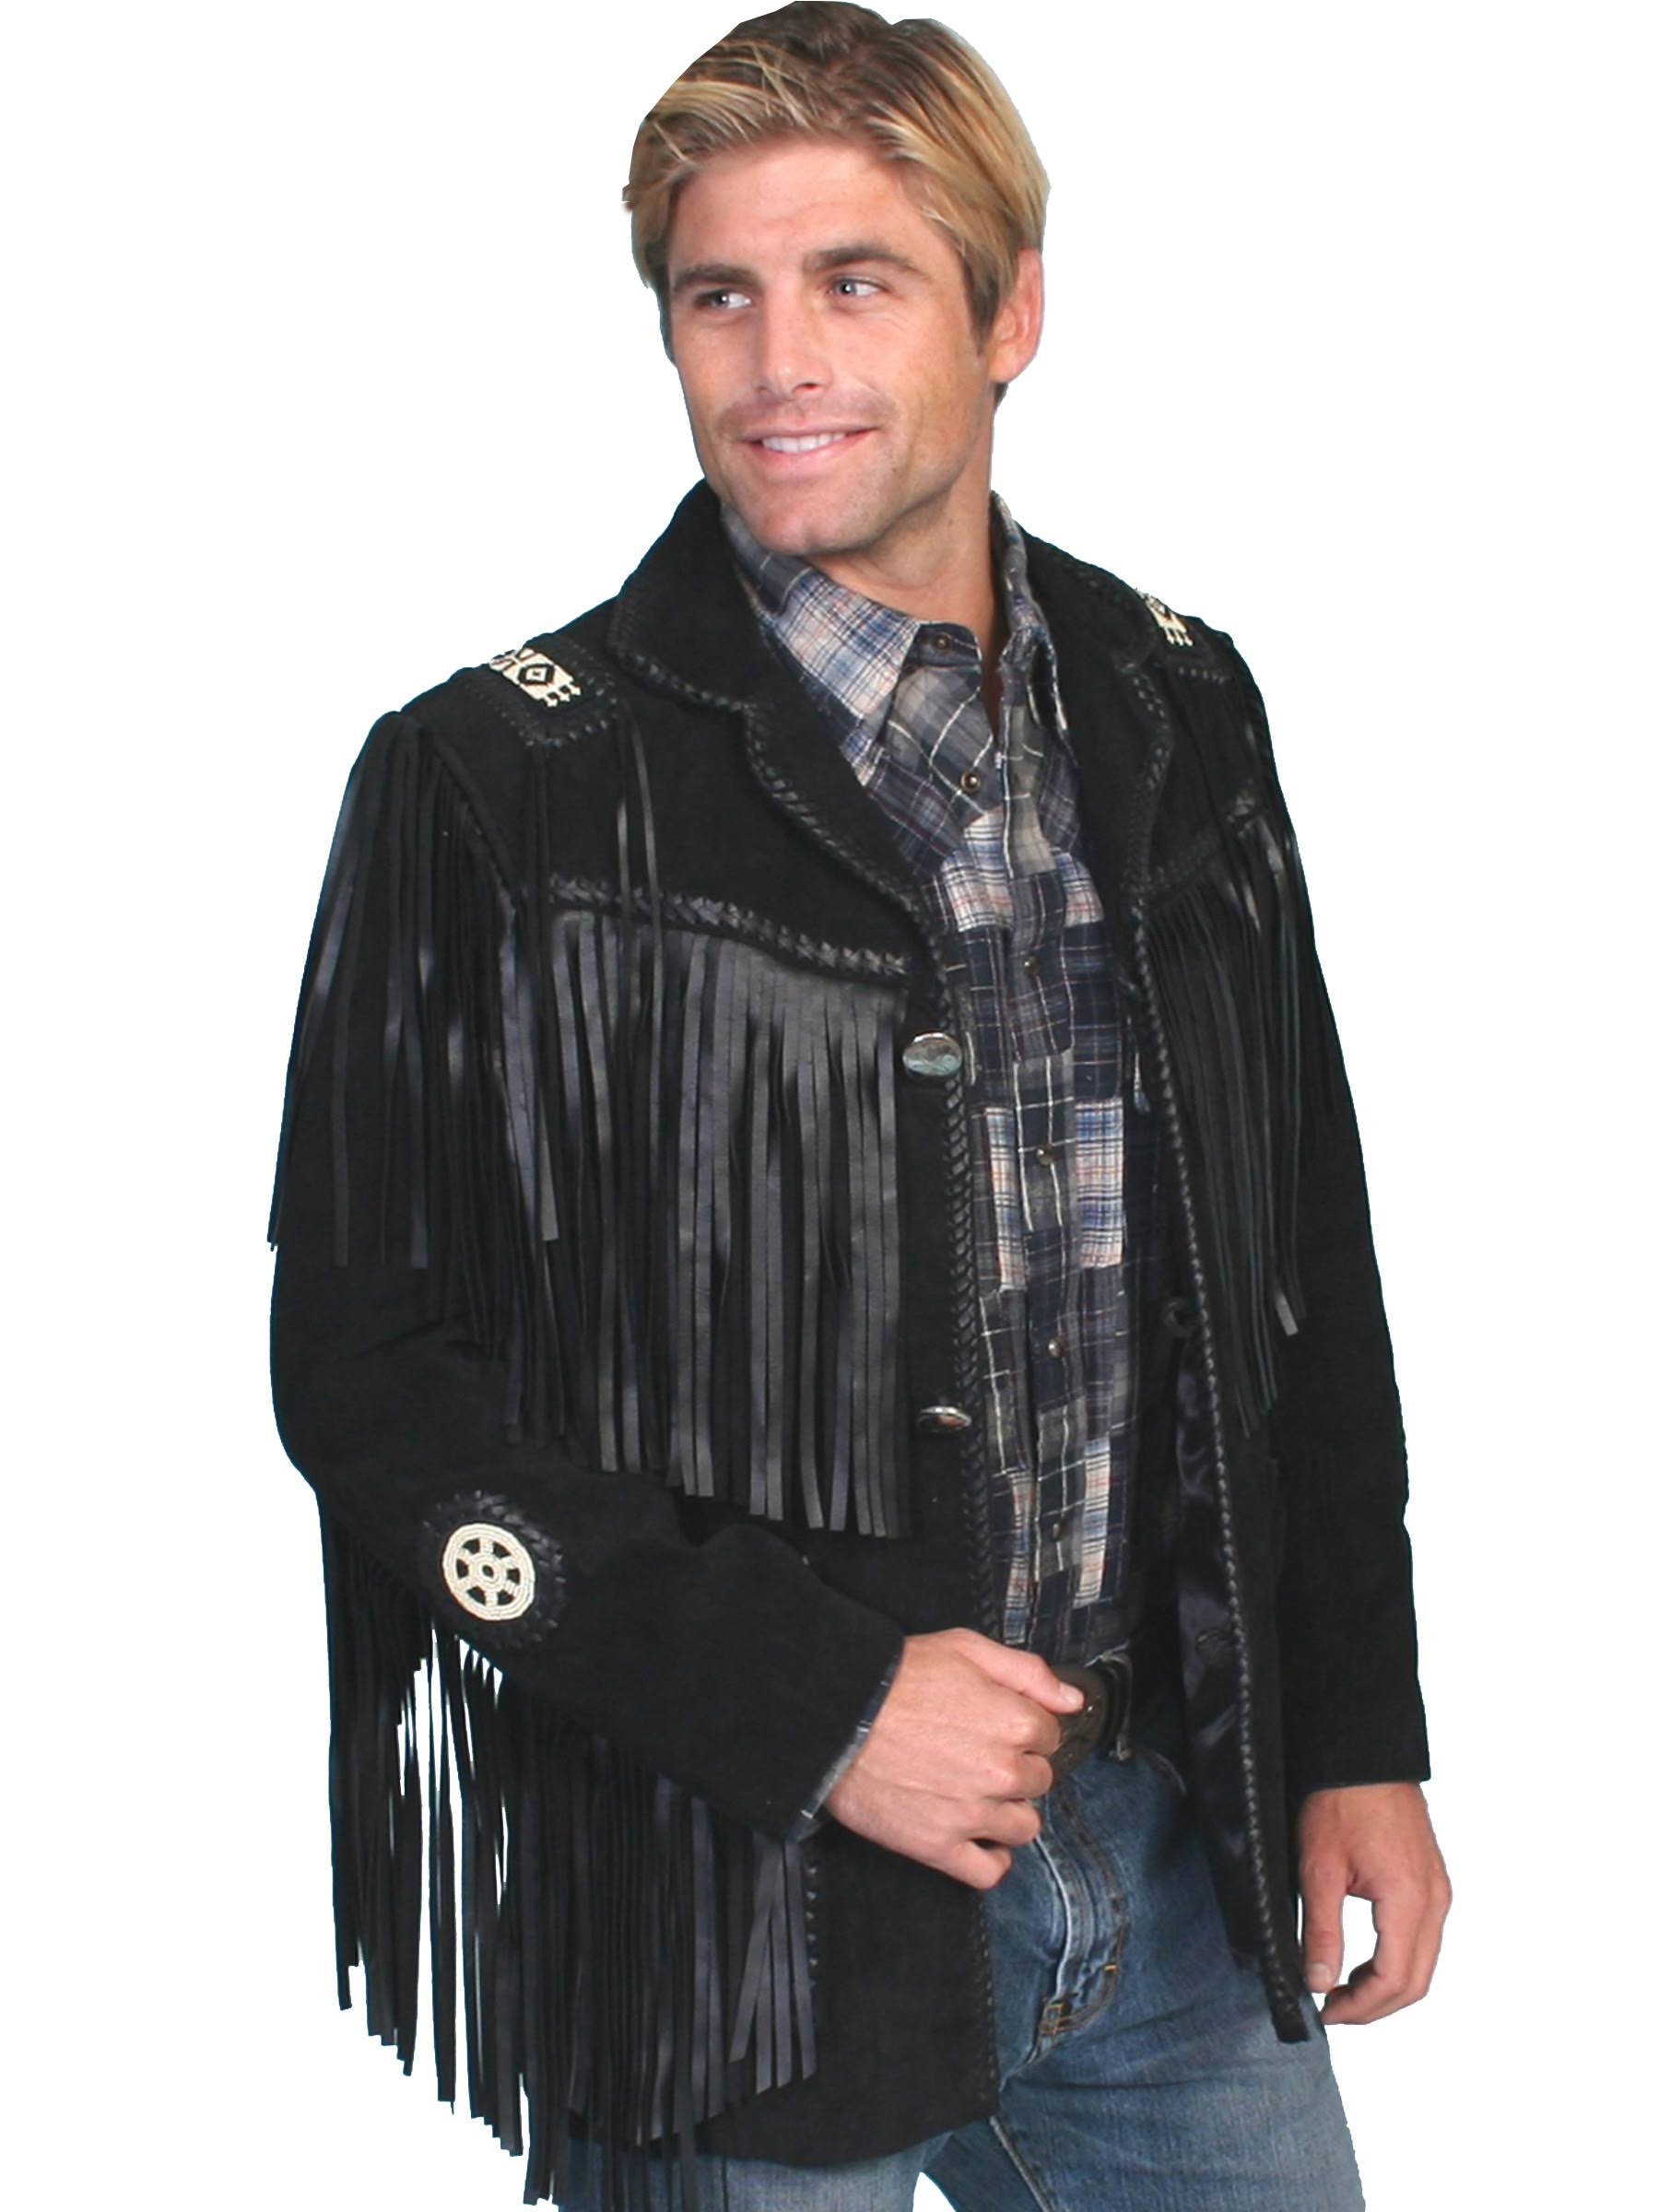 Handlaced Schwarz Coat Scully 36 Trim 19 758 Mens Bead ZxqfO